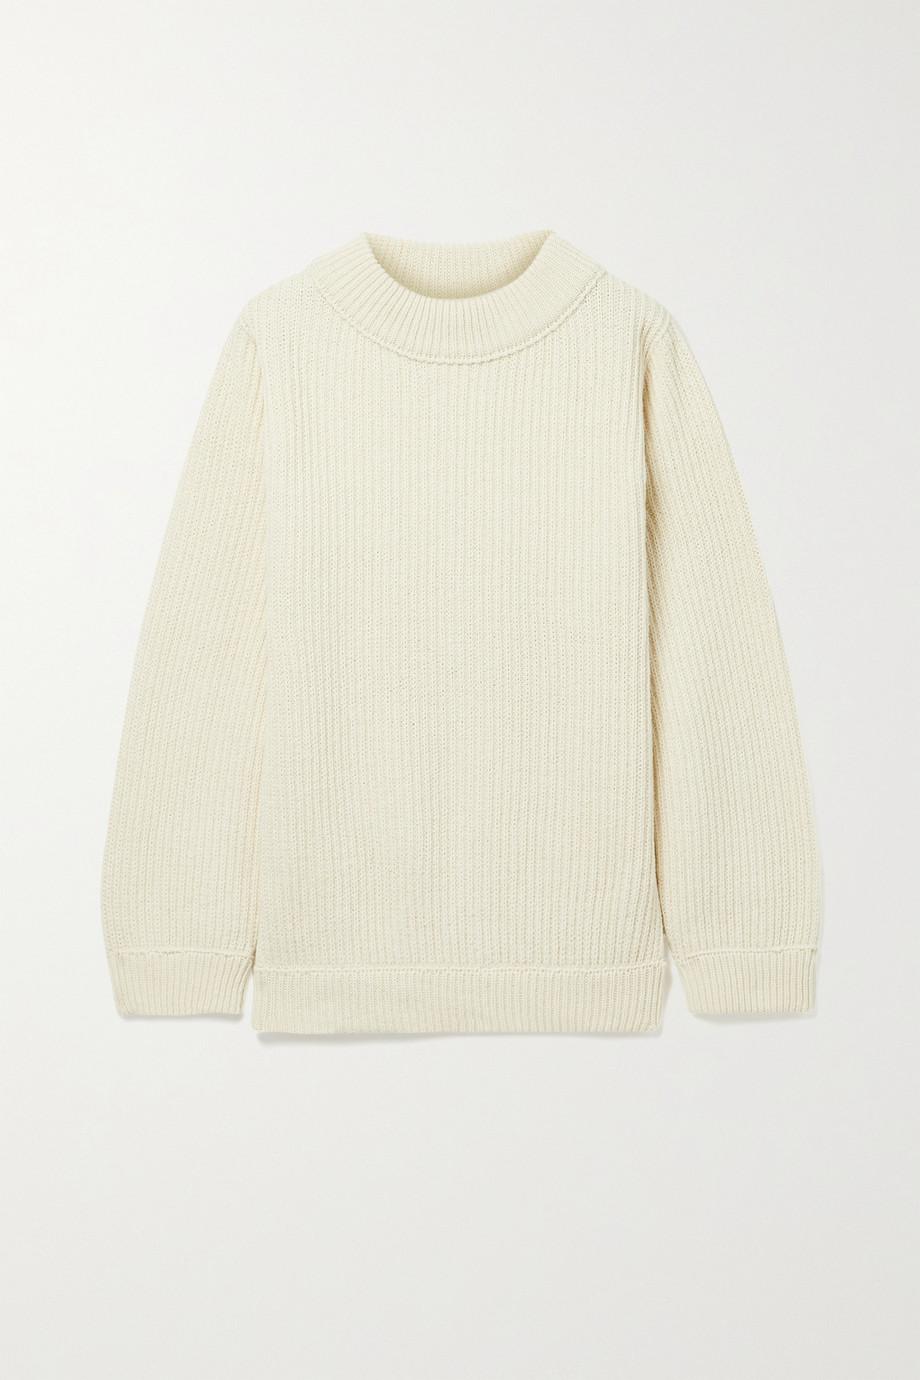 Baserange Tauro 罗纹回收羊毛有机棉质混纺毛衣